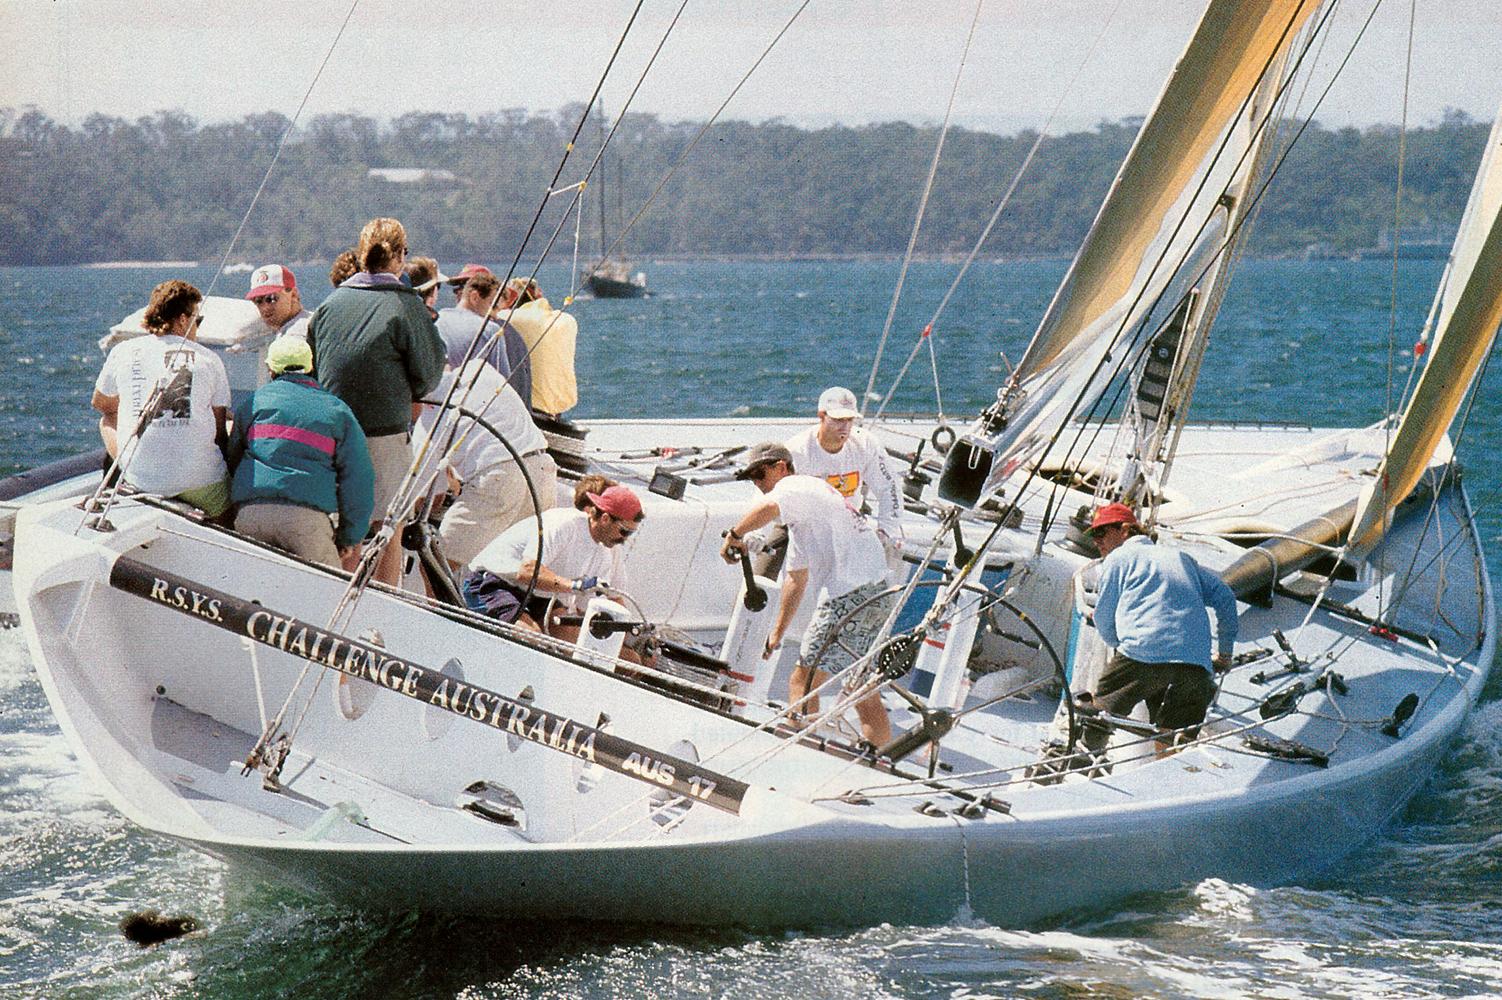 Challenge Australia